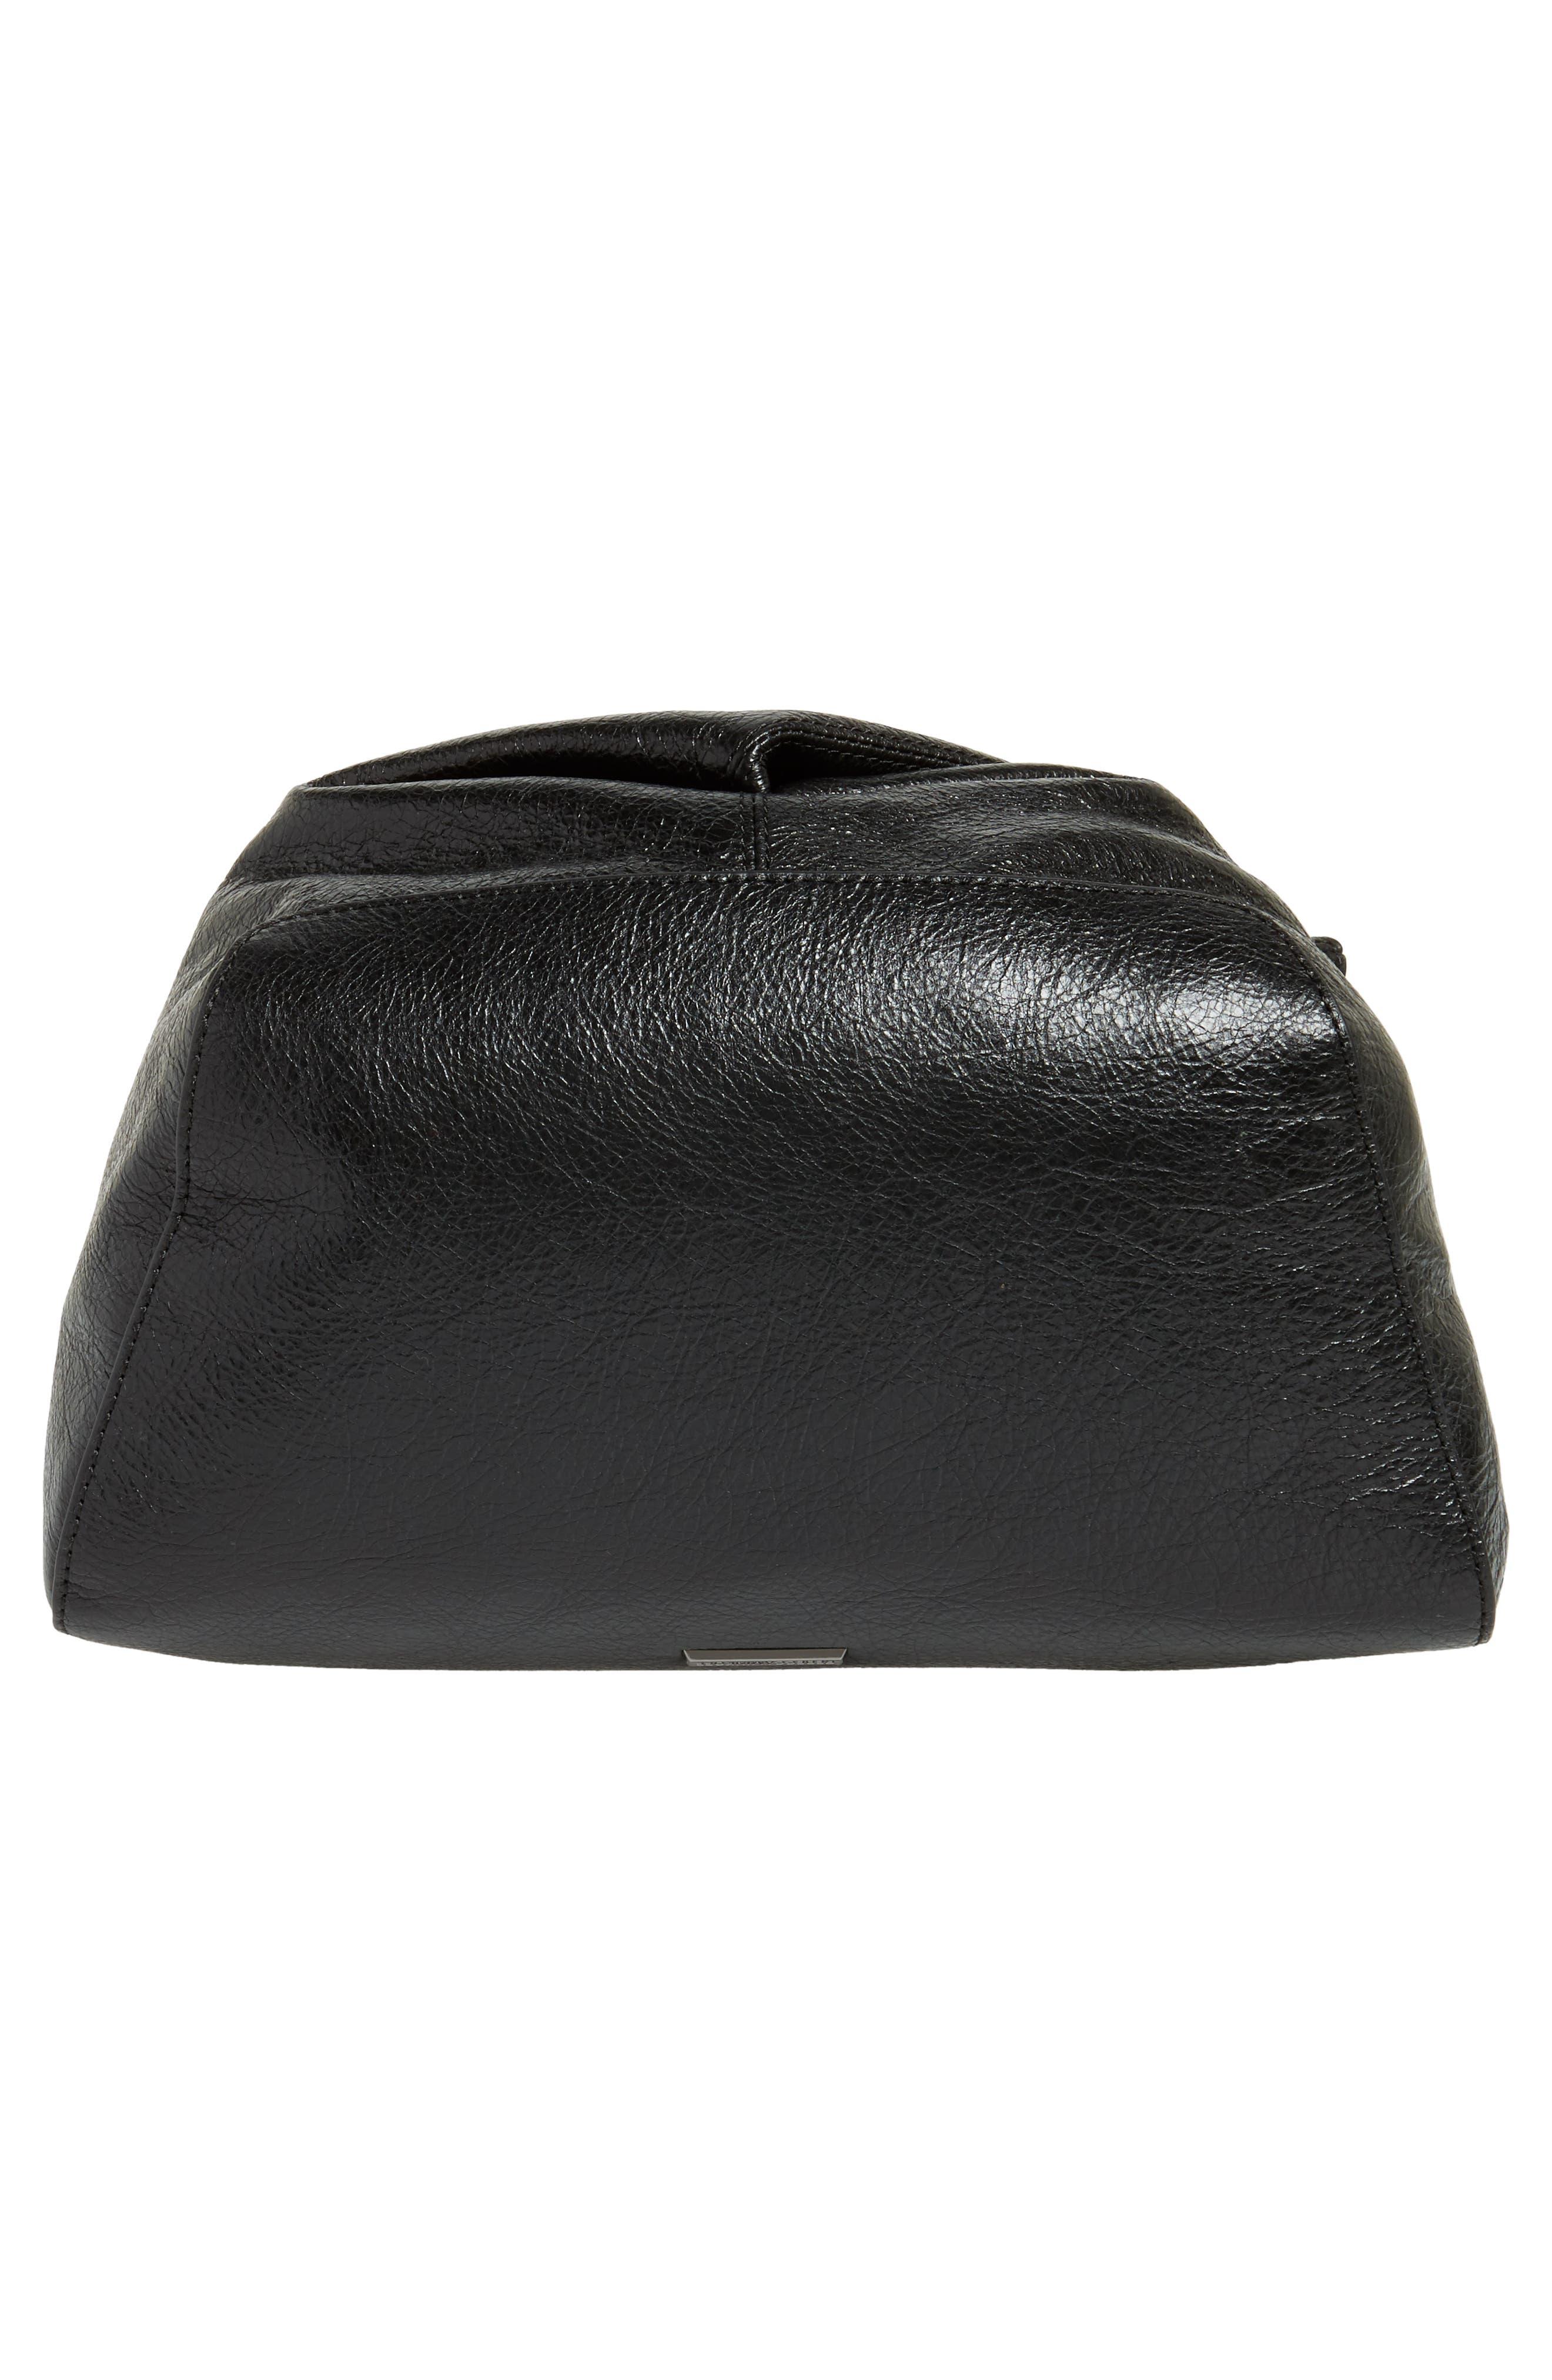 Jamie Leather Backpack,                             Alternate thumbnail 6, color,                             Black